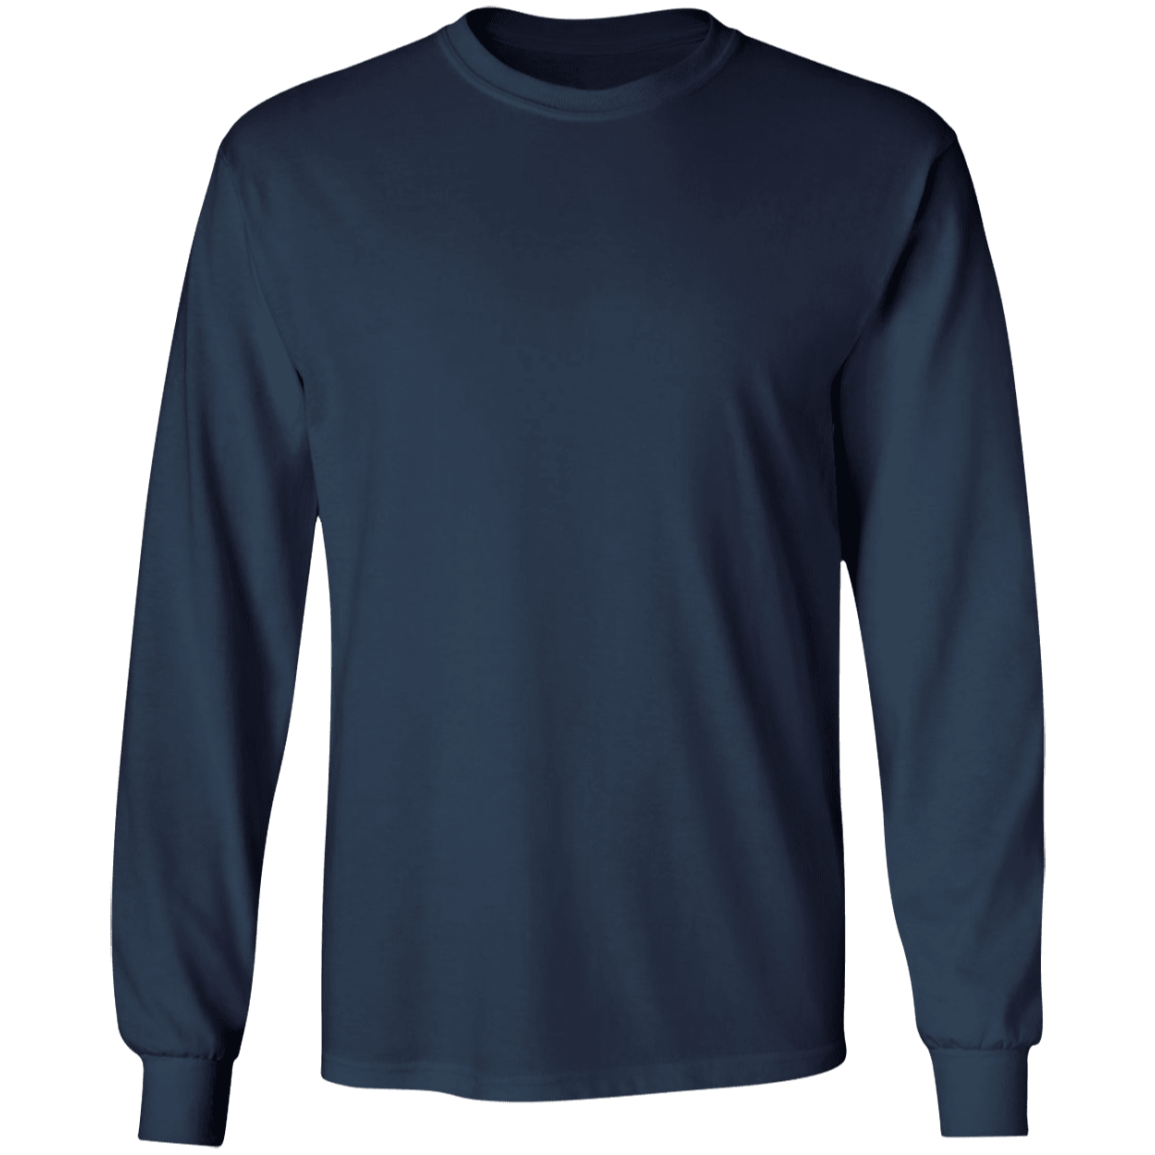 1544d66c91 Naperville North High School Long Sleeve Ultra Cotton T-Shirt -  SpiritShop.com